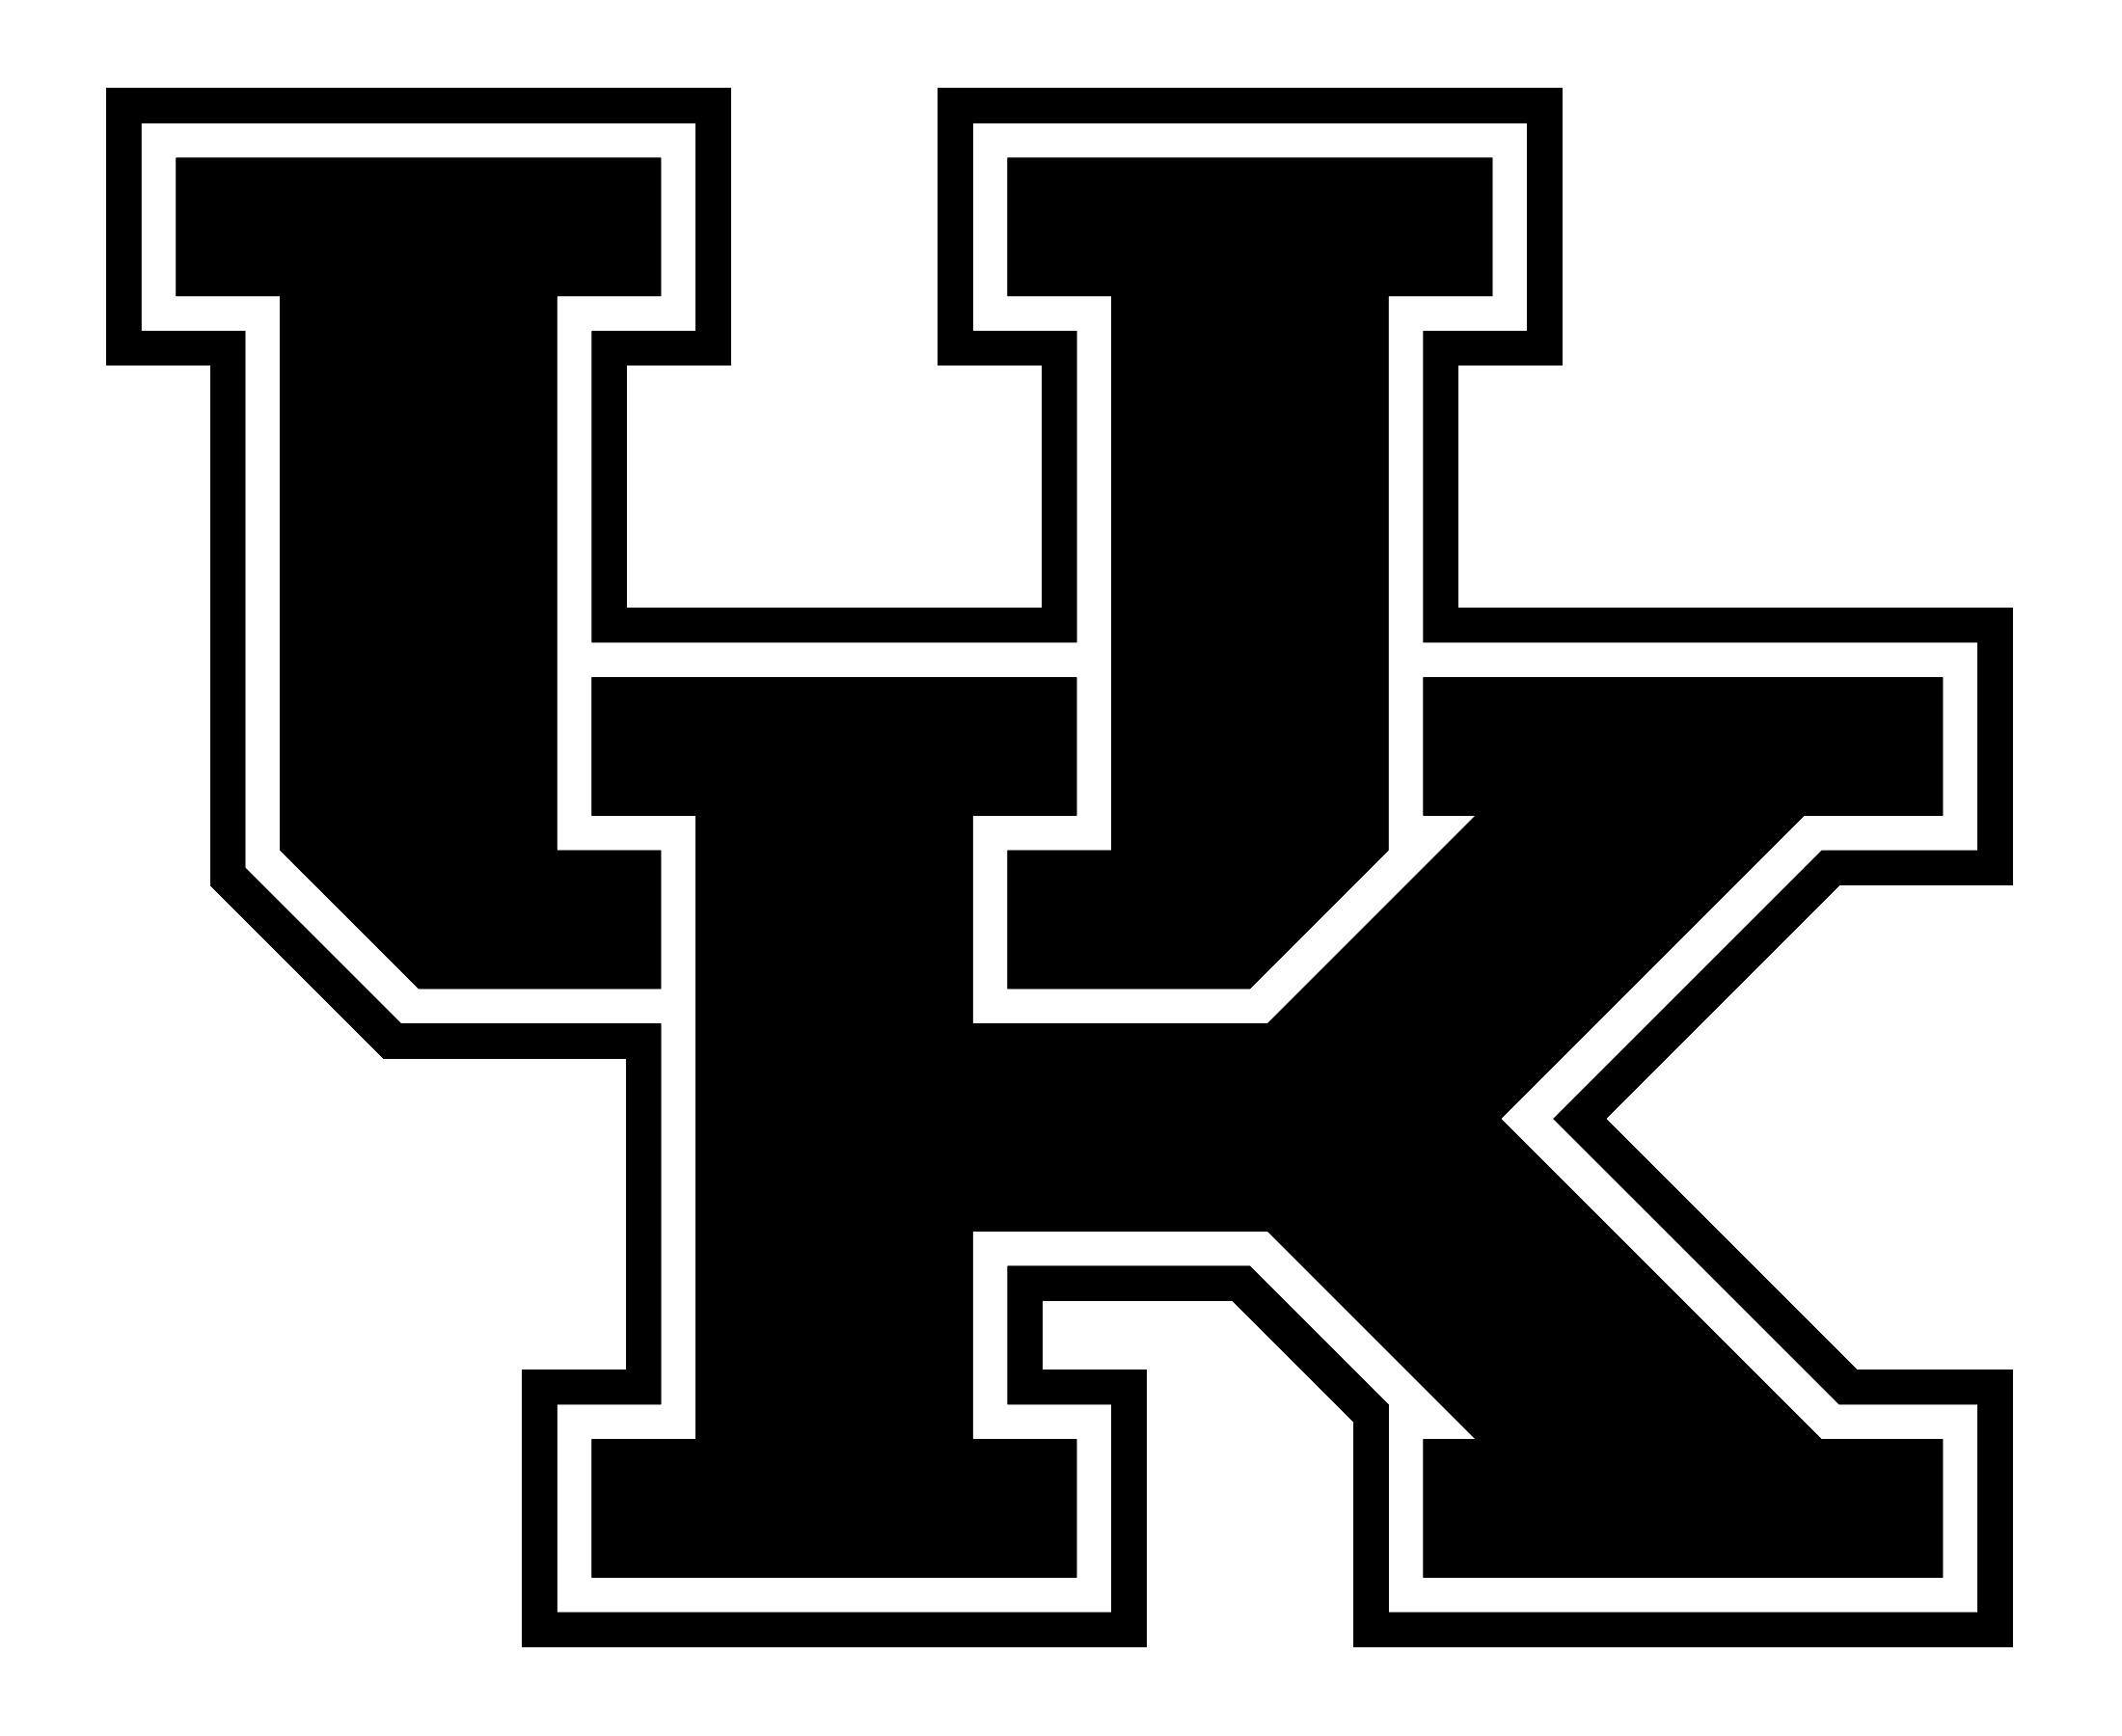 Kentucky Basketball Images Go Big Blue Hd Wallpaper And: University Of Kentucky Logo, University Of Kentucky Symbol